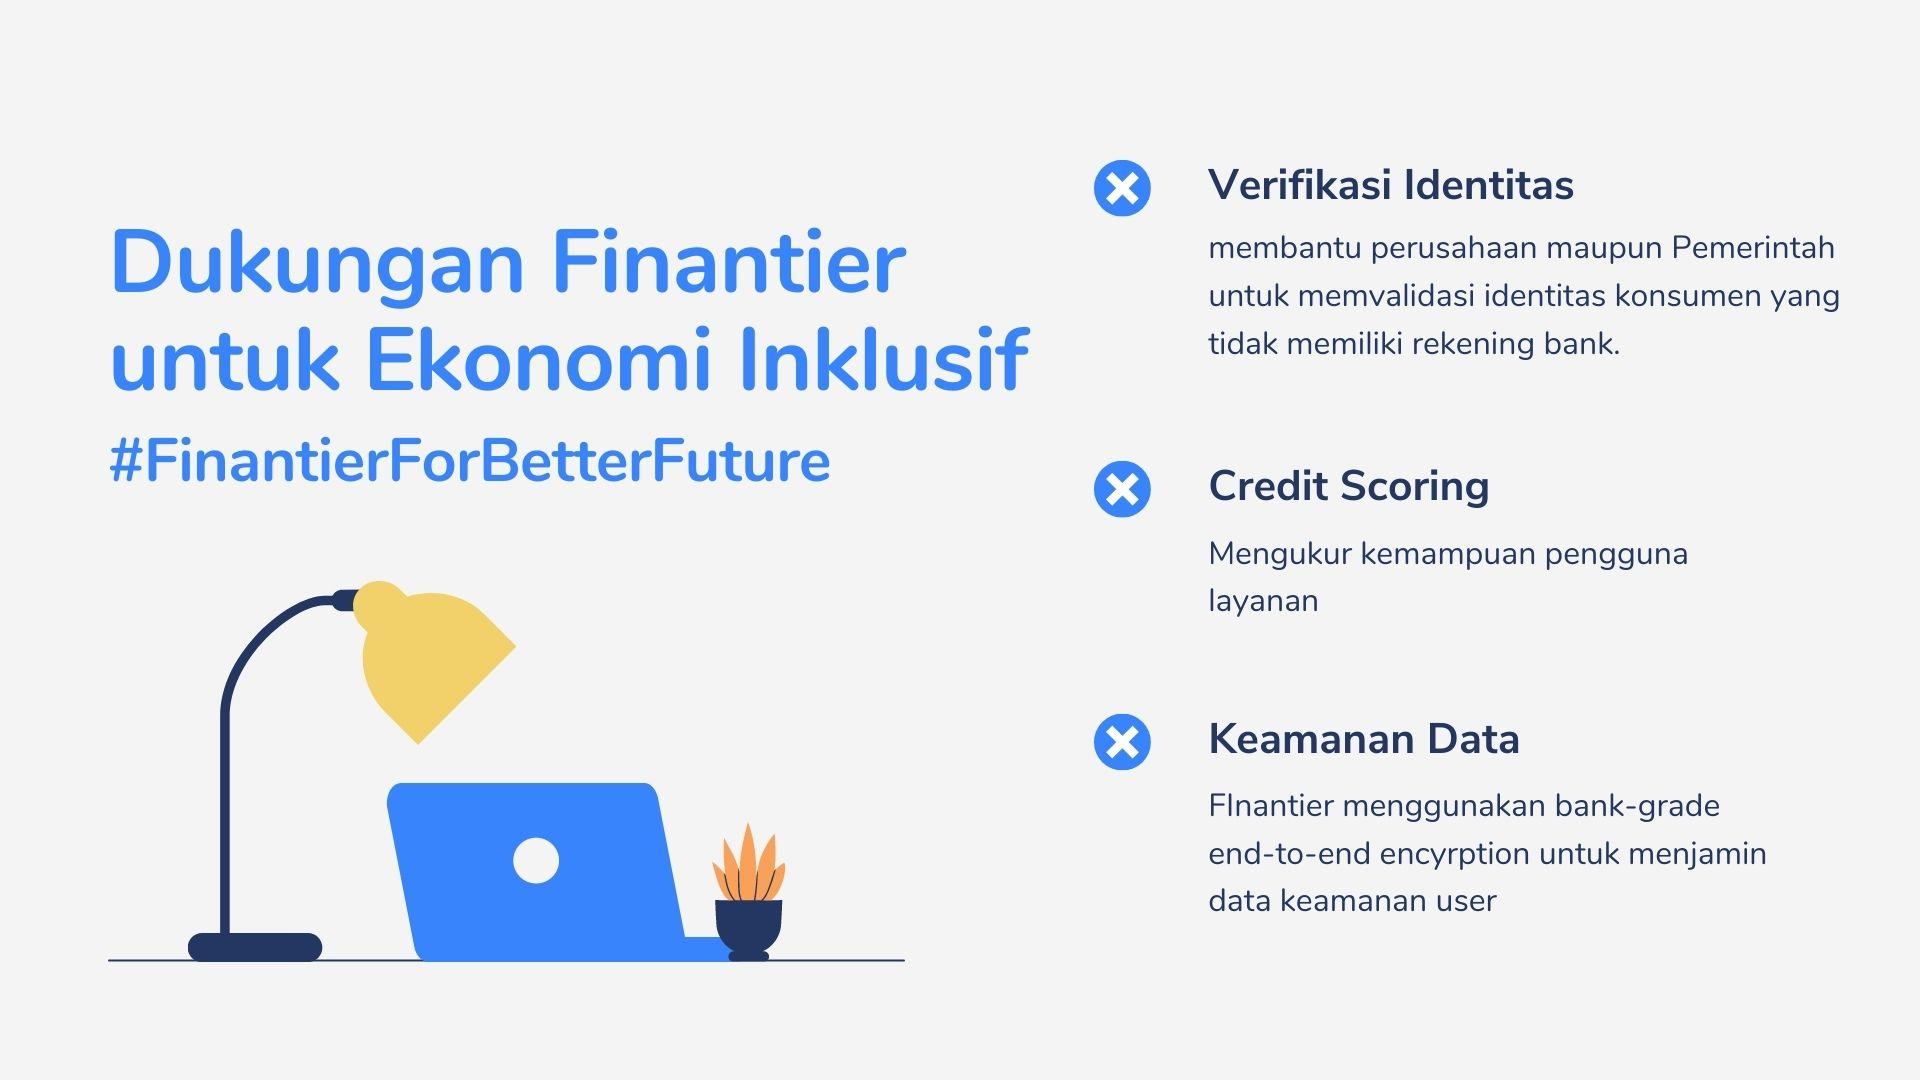 finantier for better future